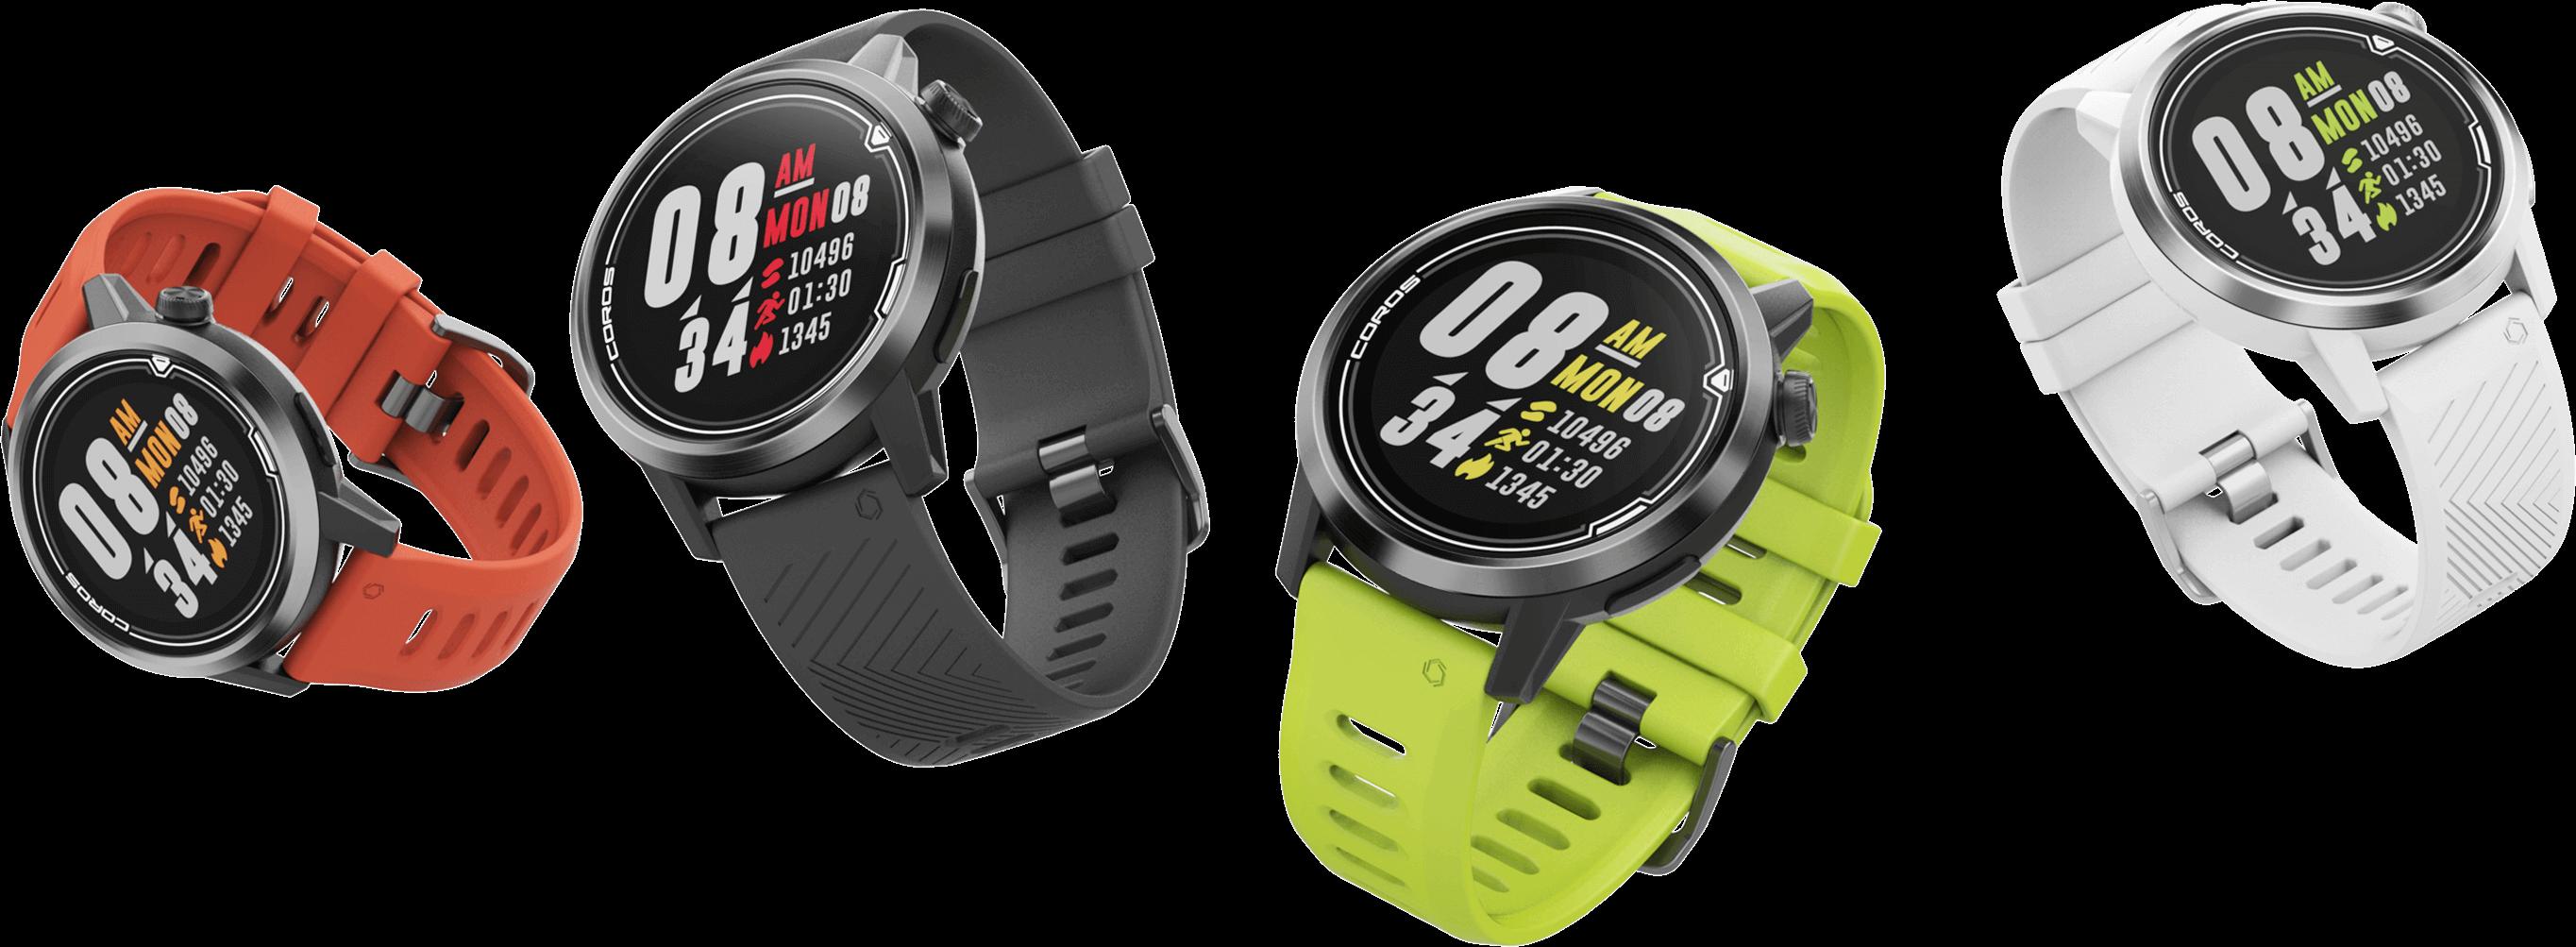 COROS APEX 42mm Premium Multisport GPS Watch, Coros Apex, Smartwatch, smartwatches, fitness watch, smartwatch malaysia